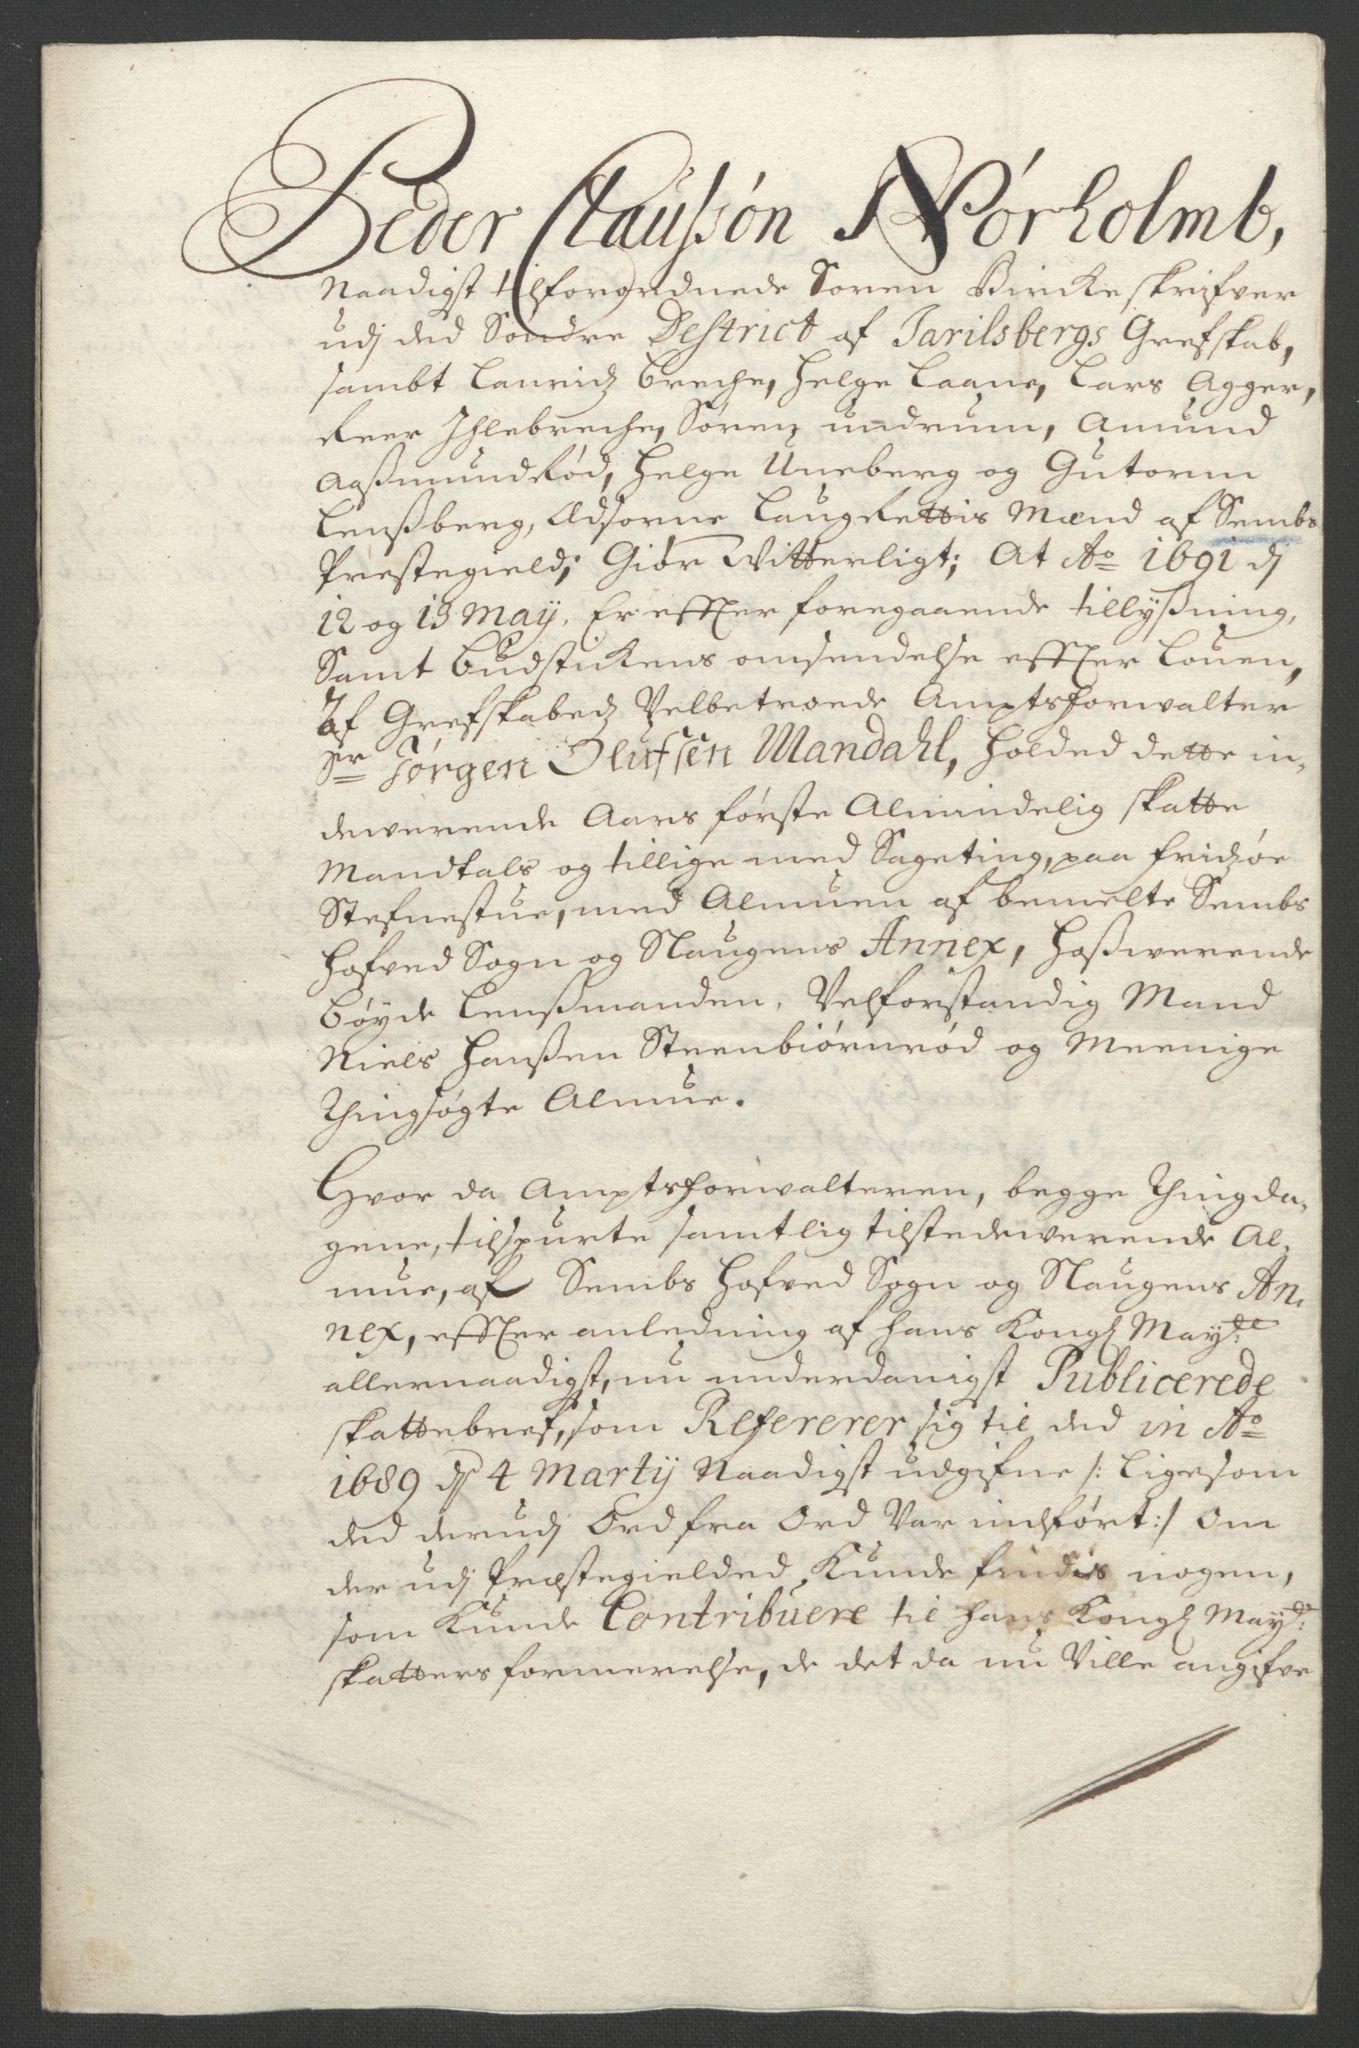 RA, Rentekammeret inntil 1814, Reviderte regnskaper, Fogderegnskap, R32/L1864: Fogderegnskap Jarlsberg grevskap, 1691, s. 412